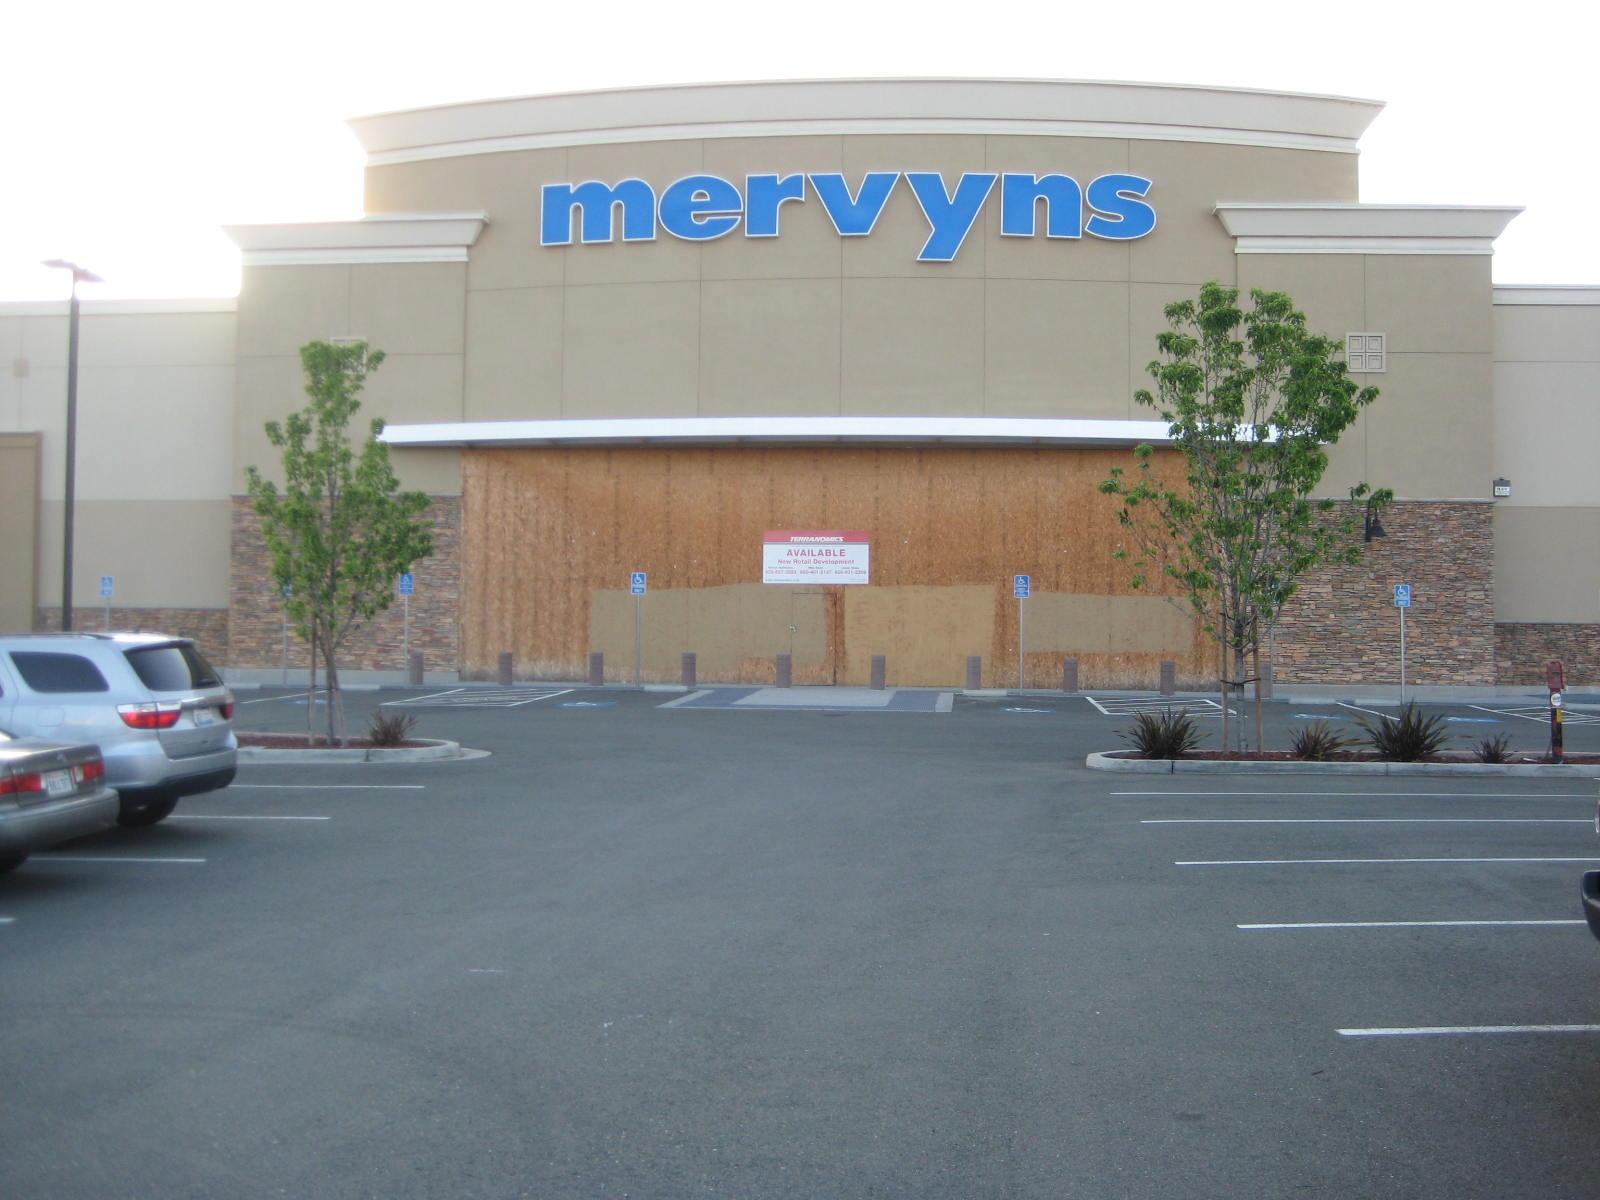 Mervyn's Building